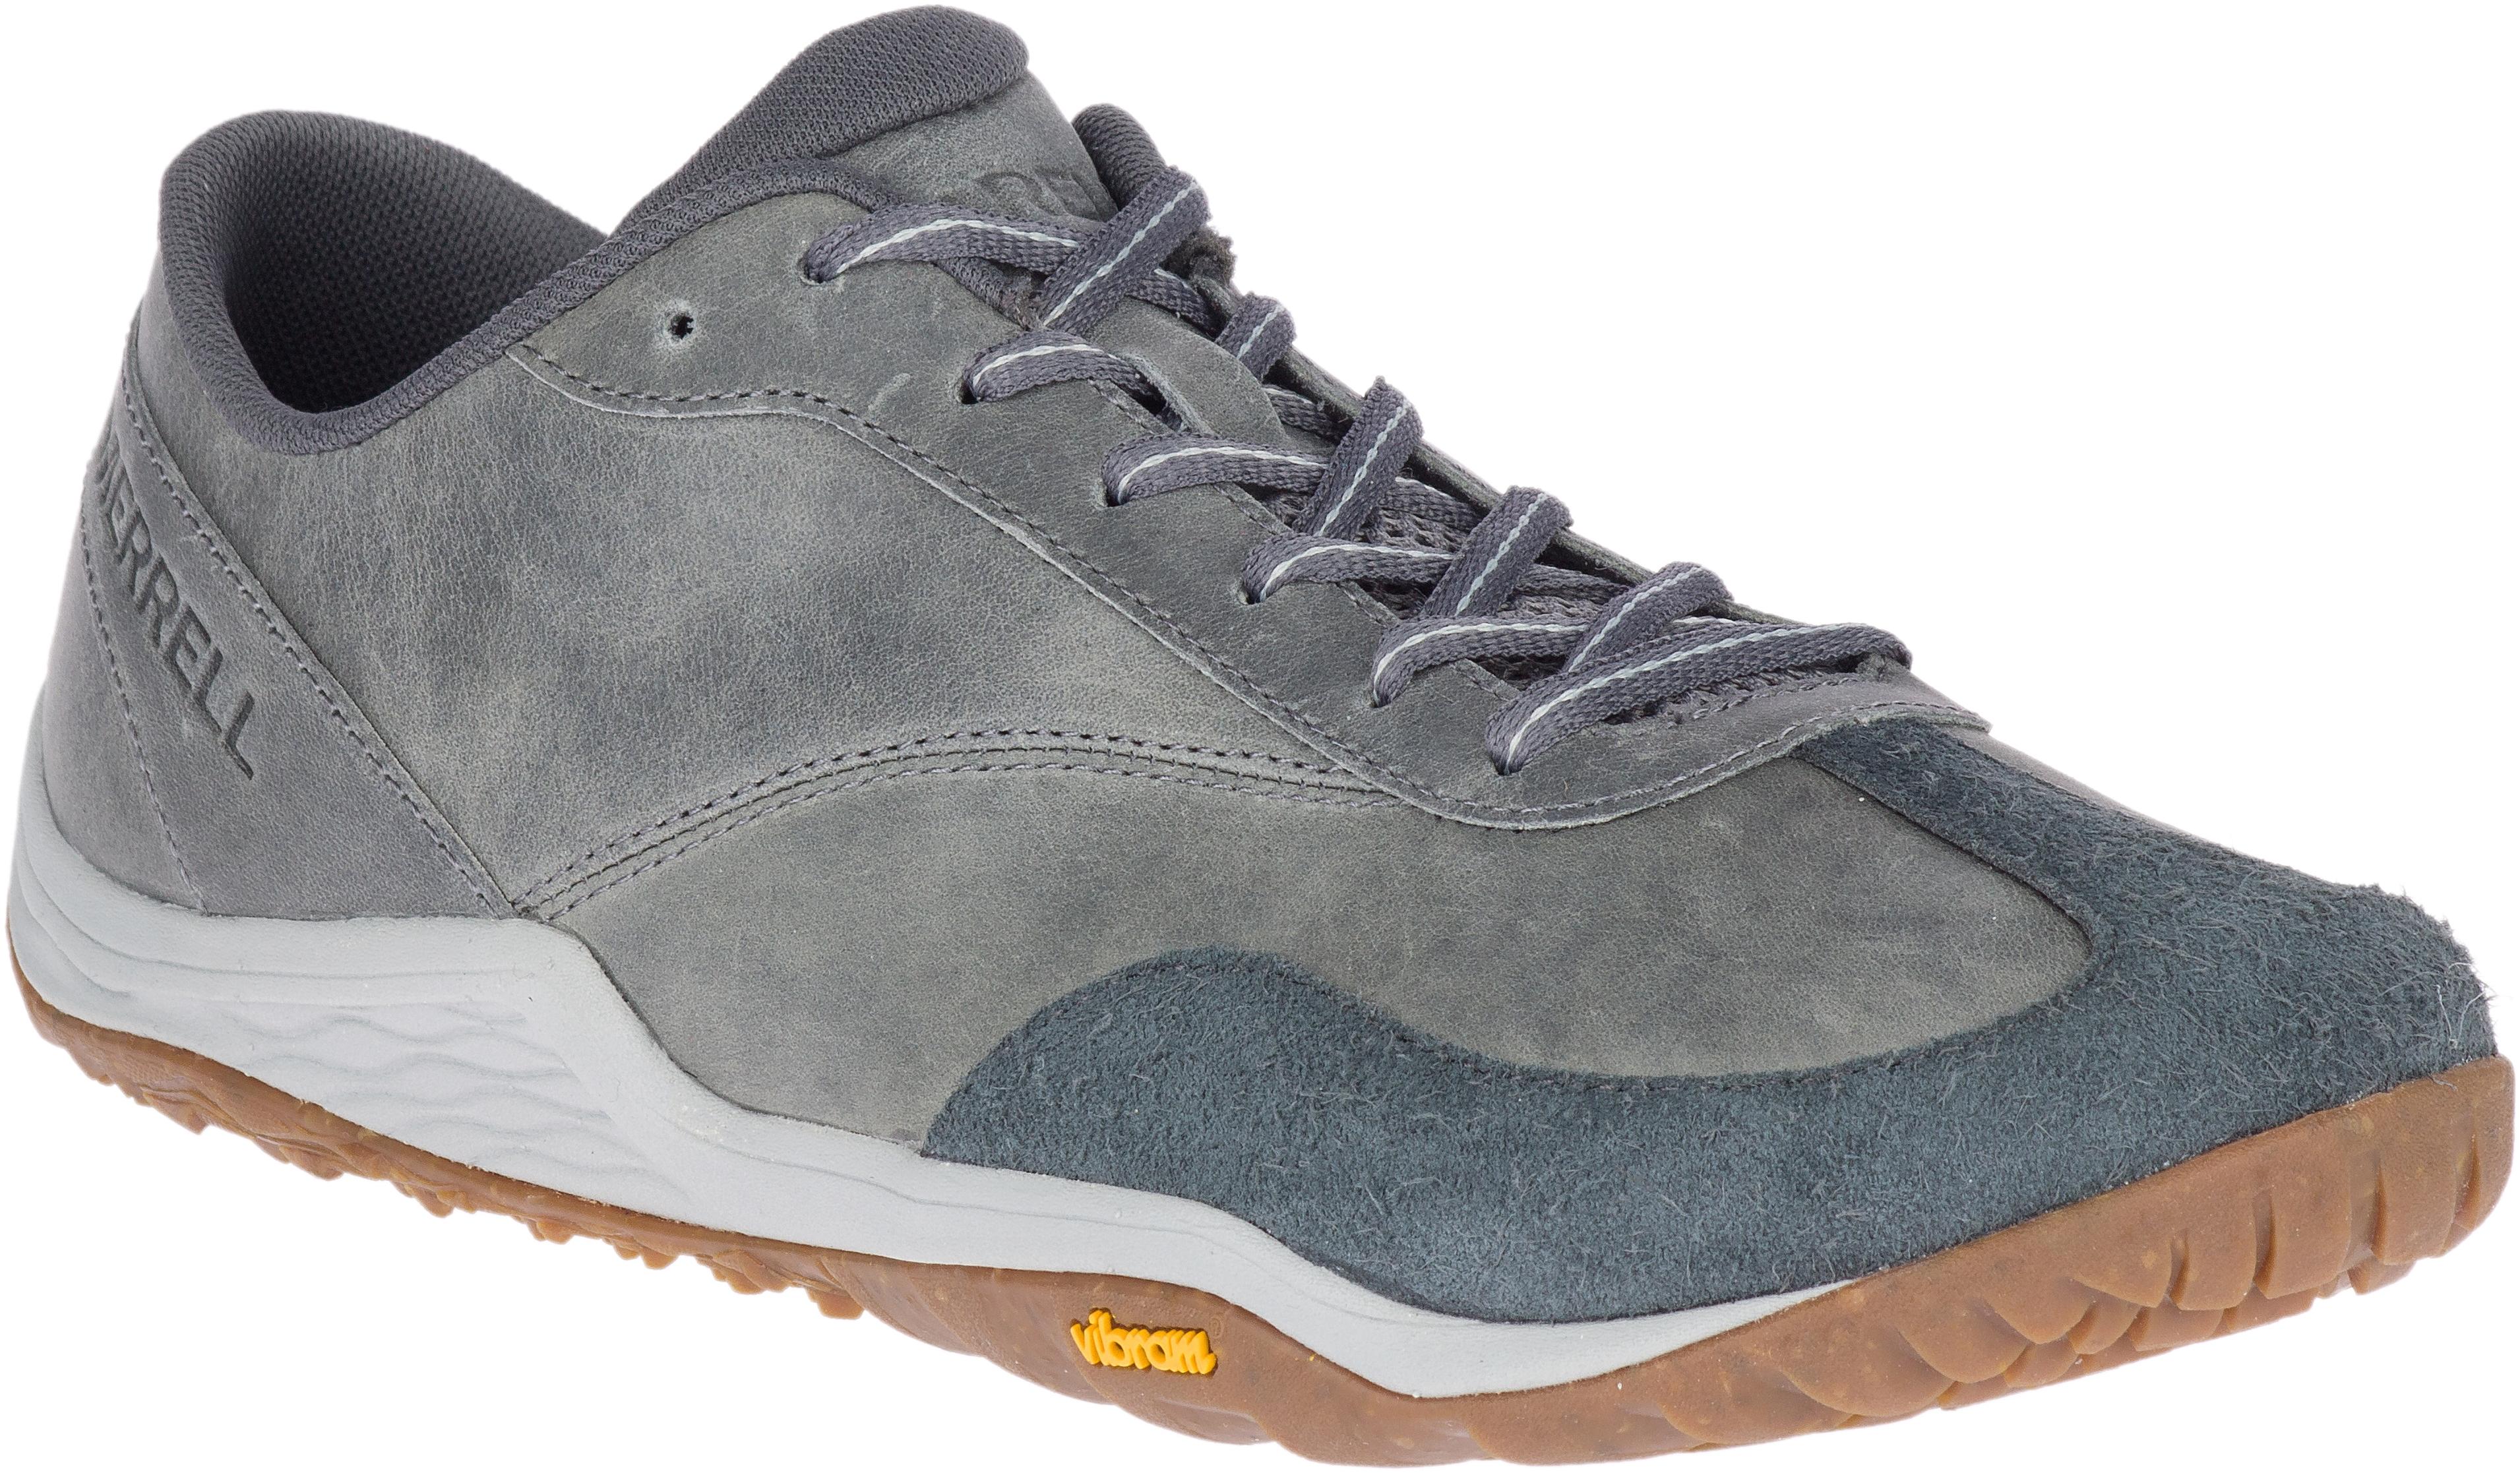 Trail Glove 5 Leather, Rock